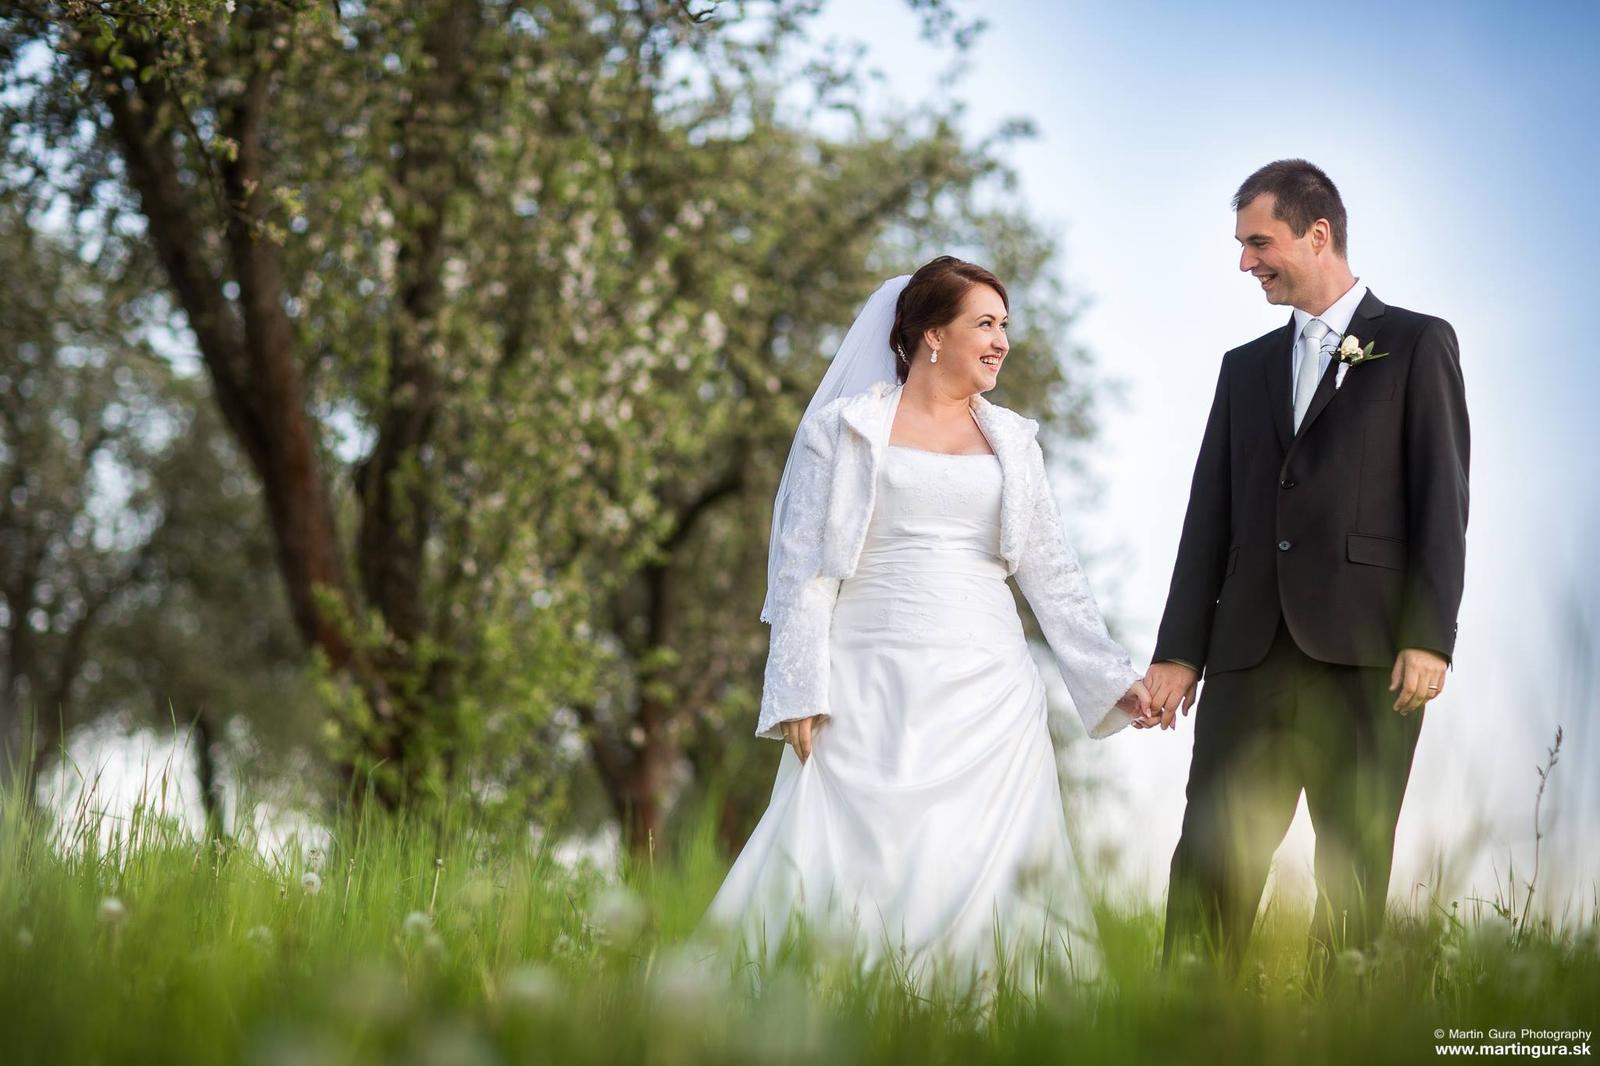 Svadba Juraj s Andrea - Obrázok č. 3